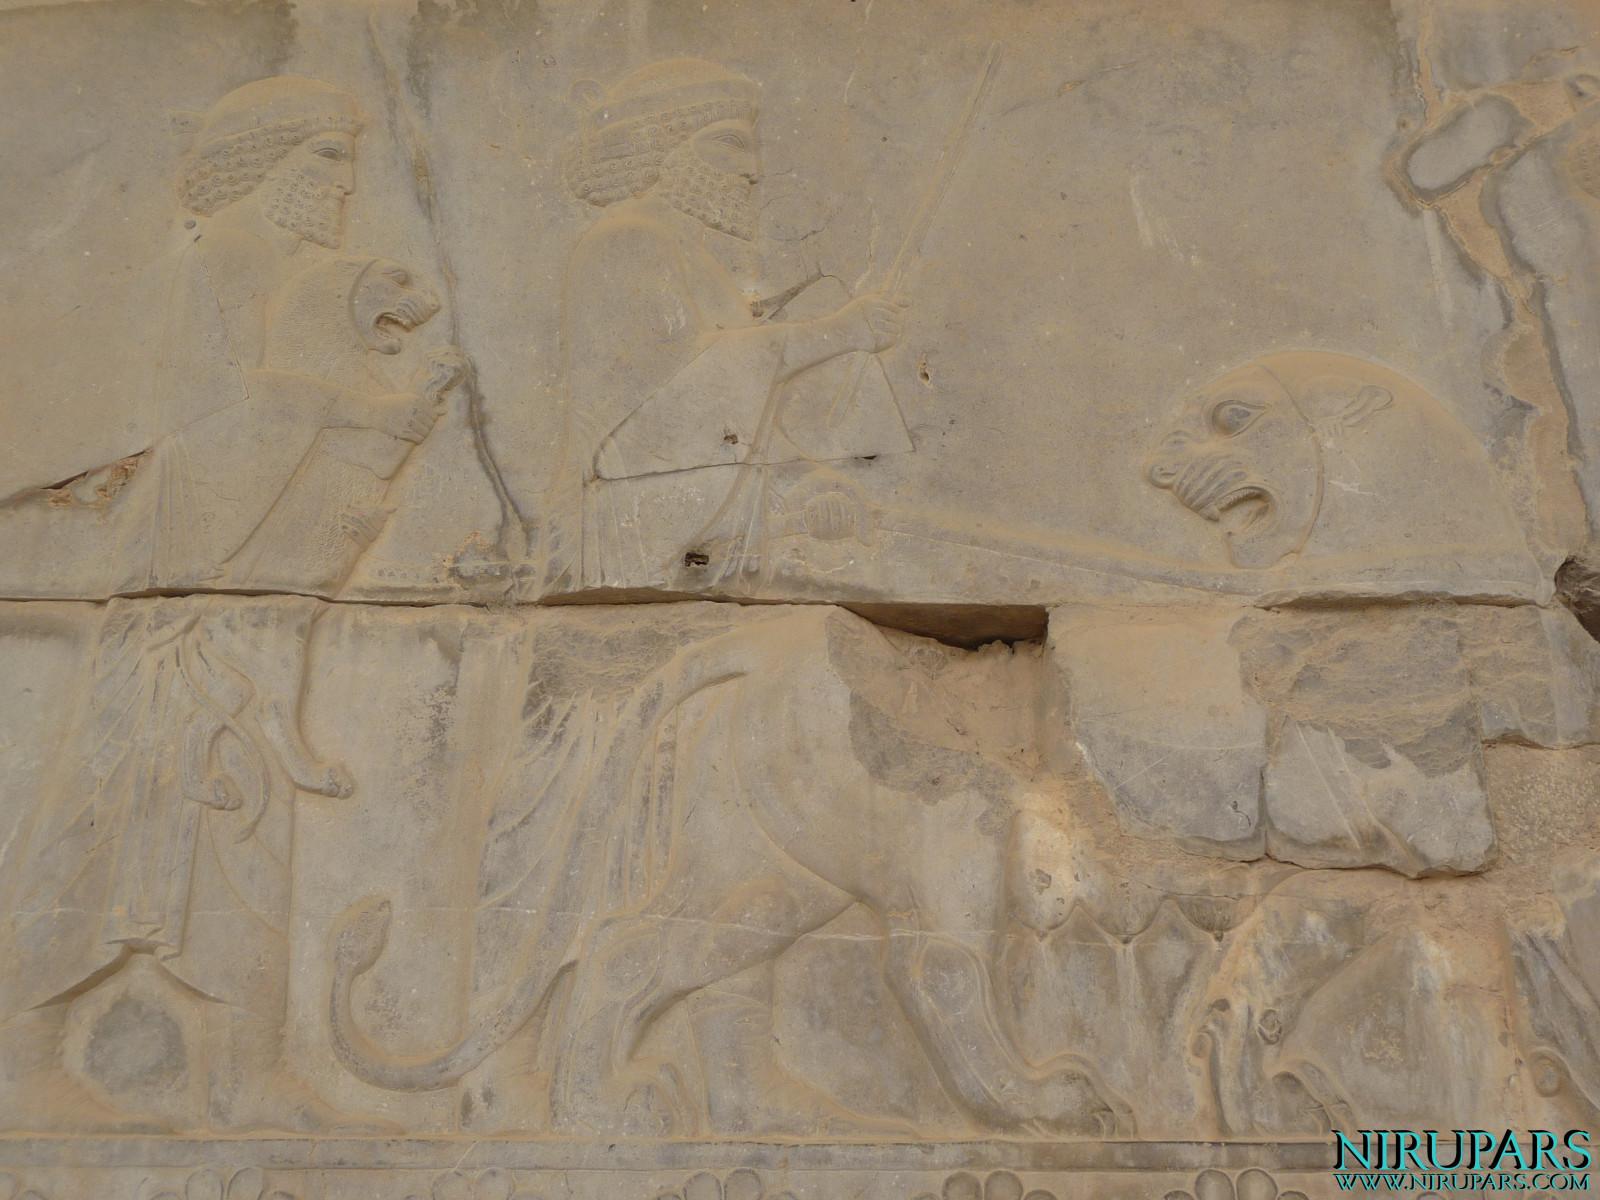 Persepolis - Apadana - East Portico - Delegation Elam - Lioness - Cub